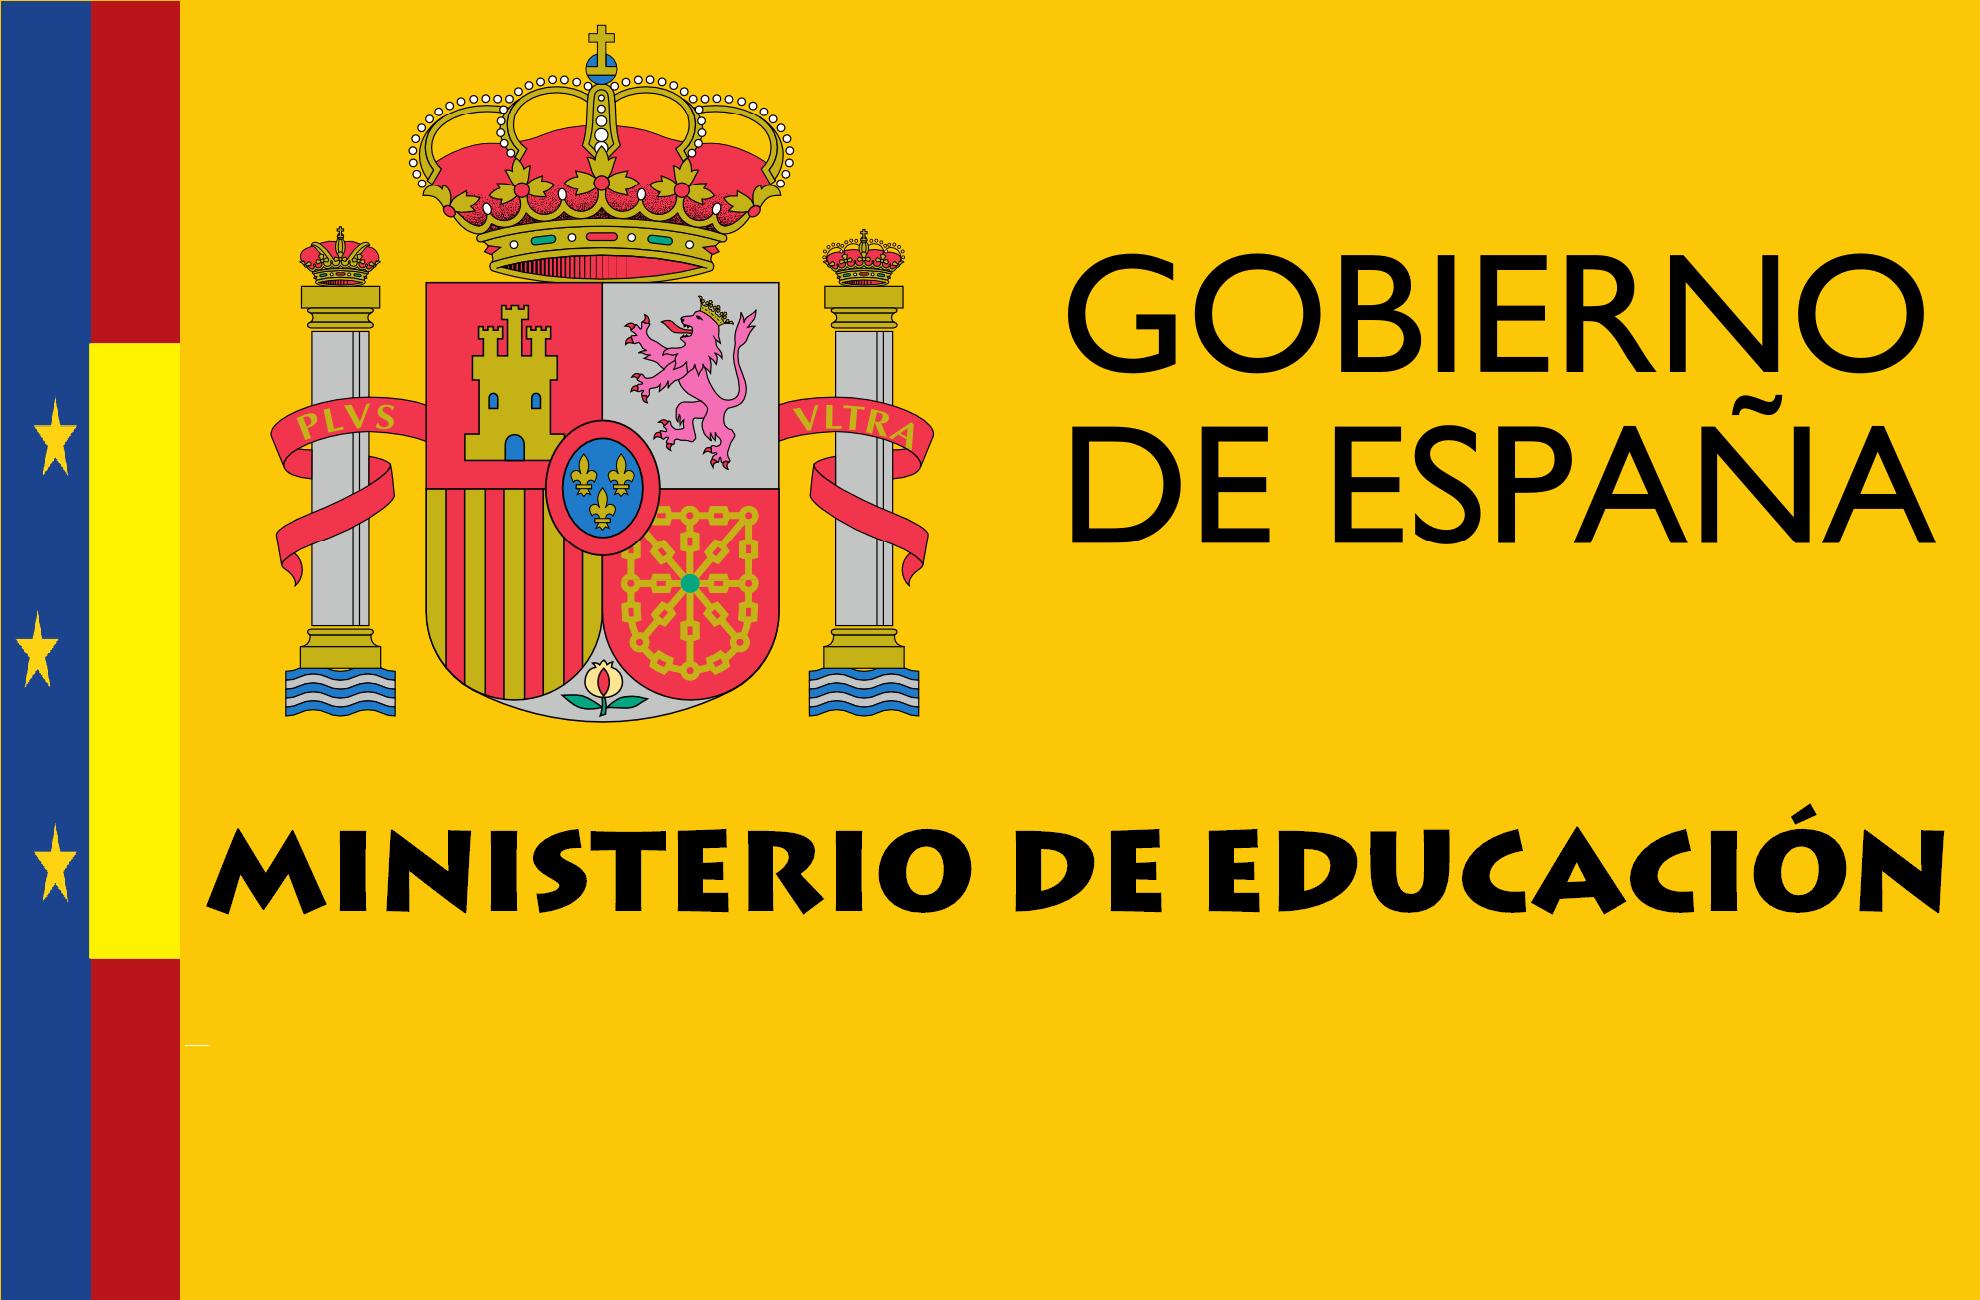 Como va lo m o sede electr nica del ministerio de educaci n for Ministerio de educacion plazas